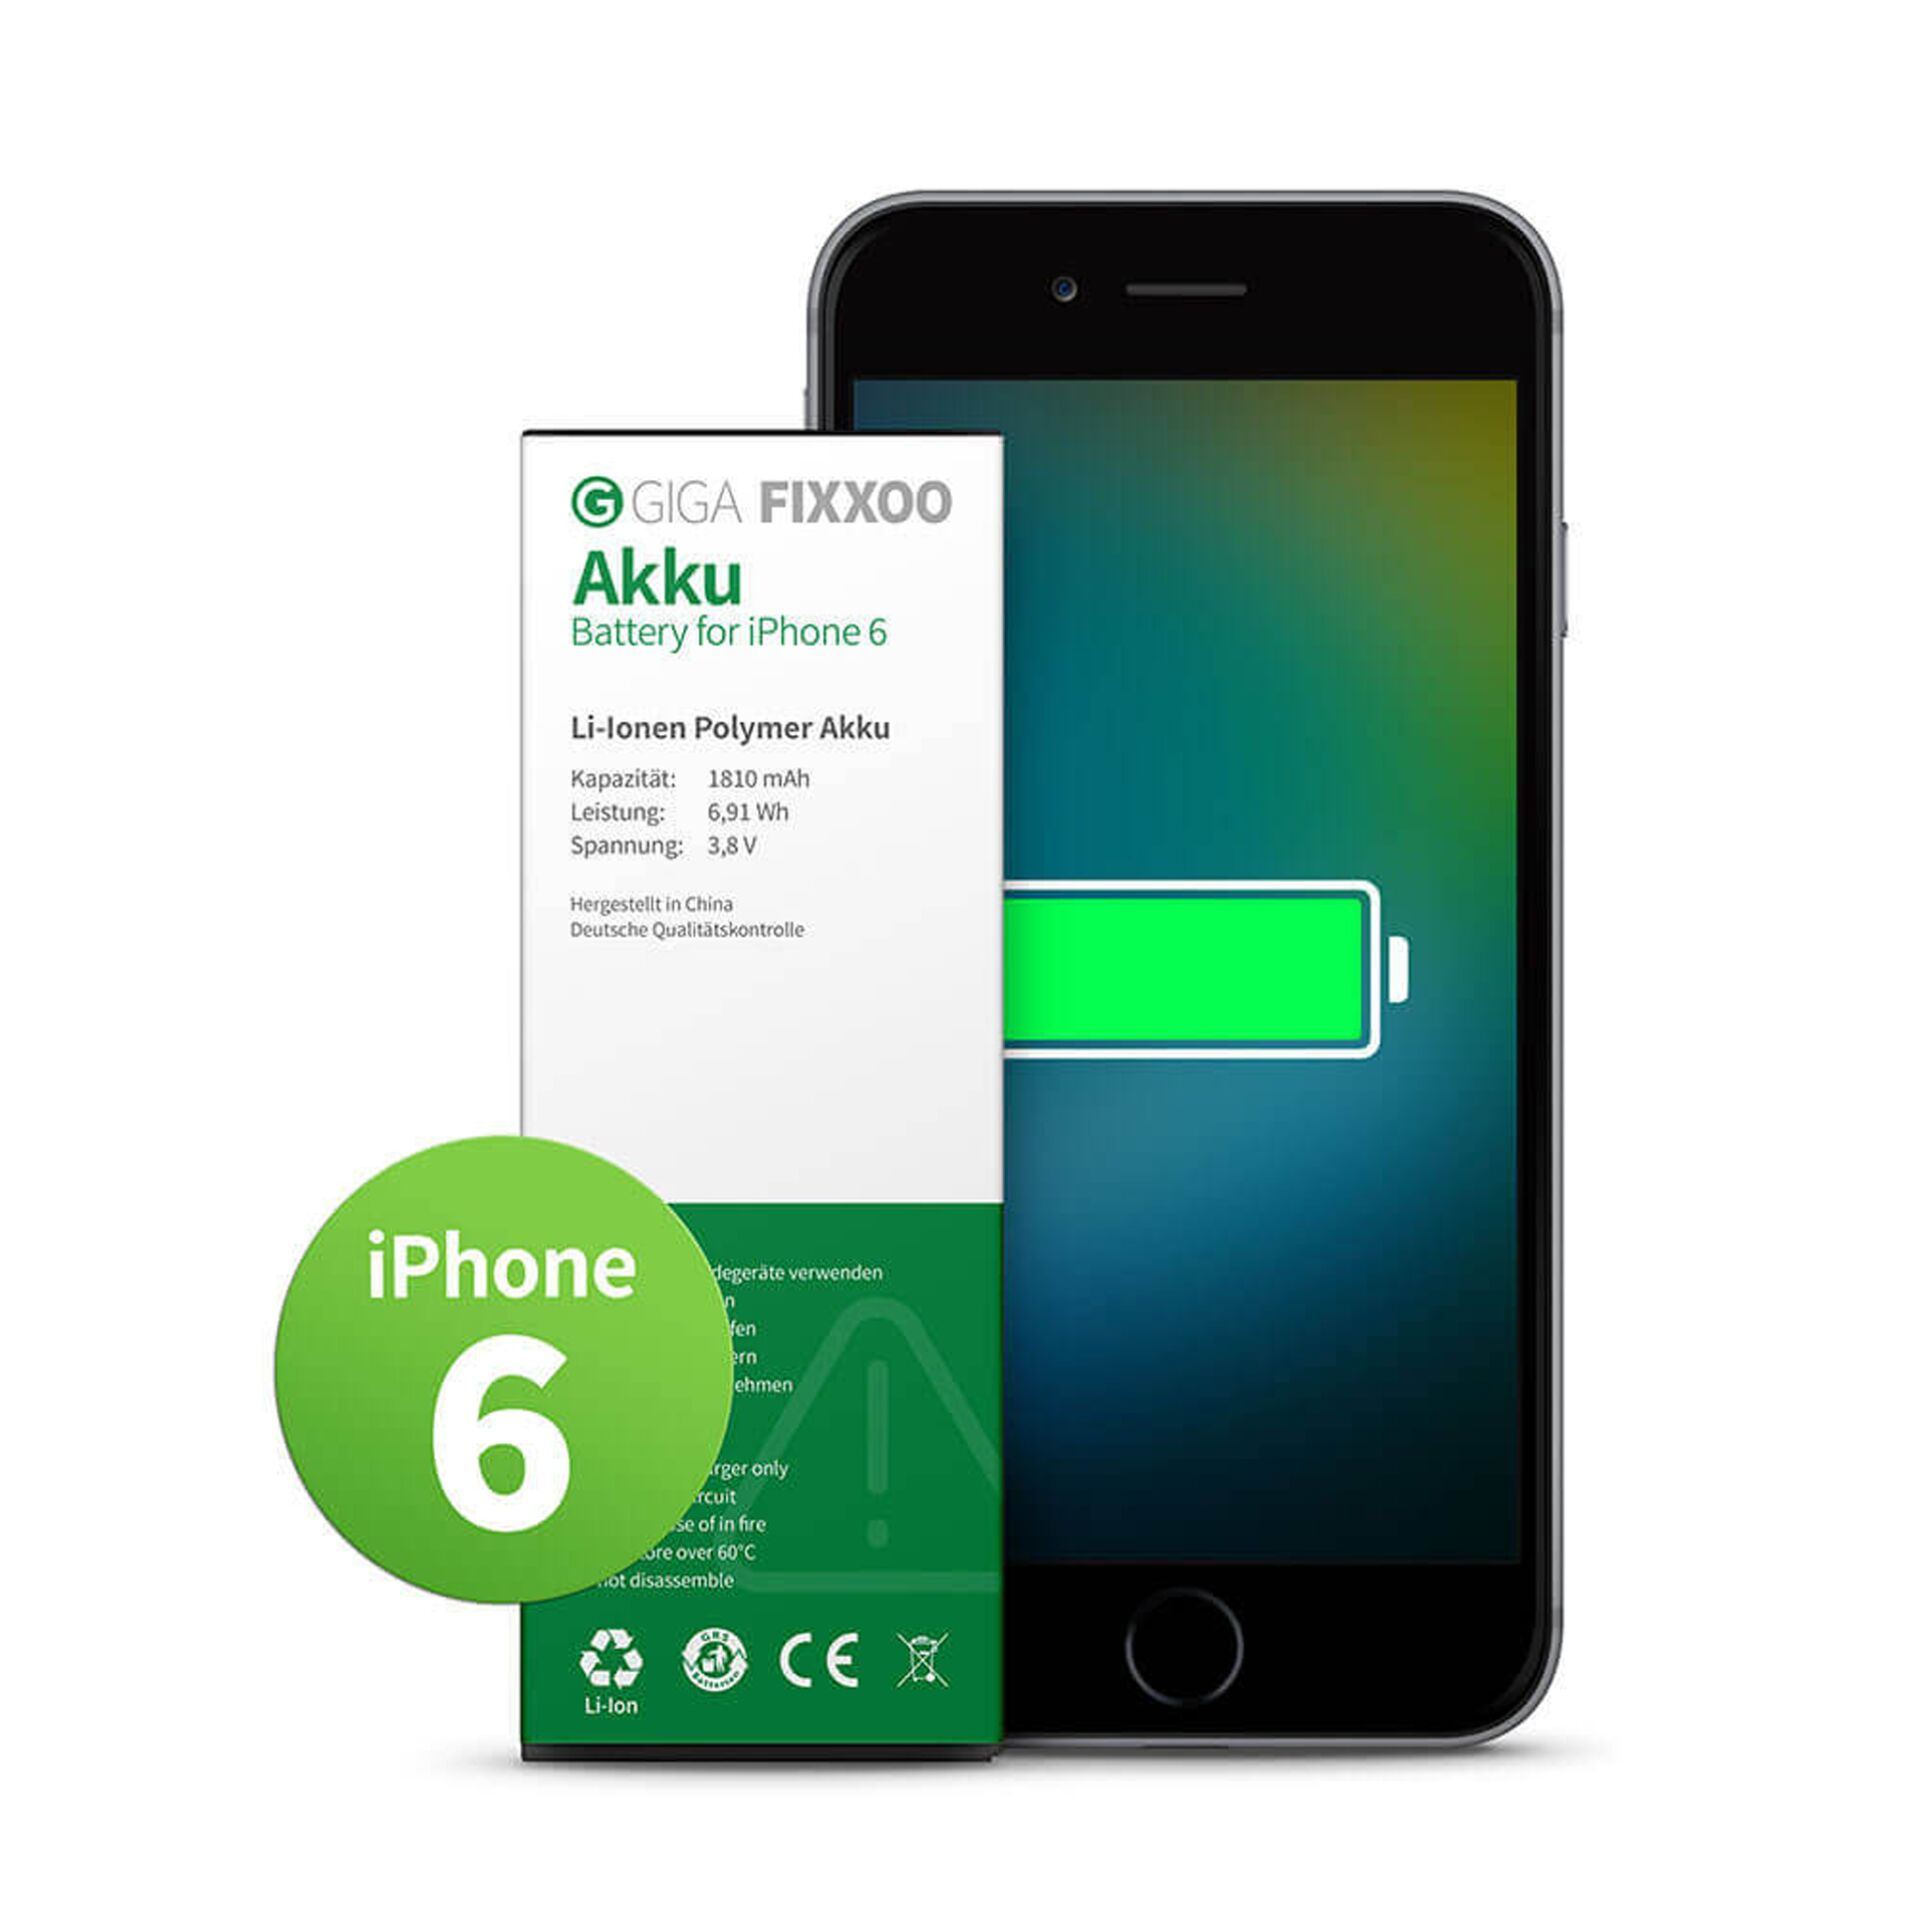 GIGA Fixxoo iPhone 6 Akku